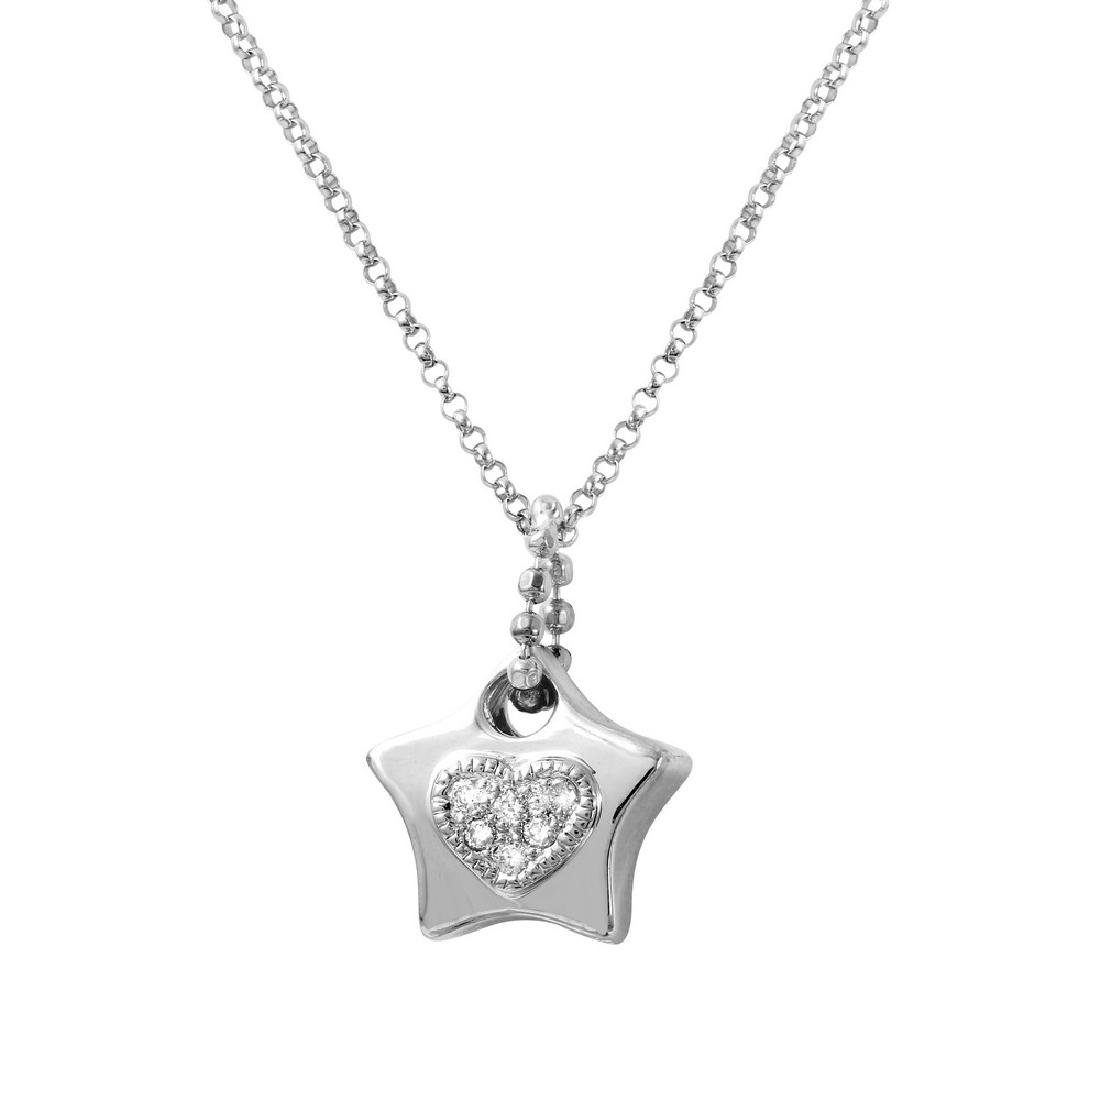 Genuine 0.14 TCW 14K White Gold Ladies Necklace